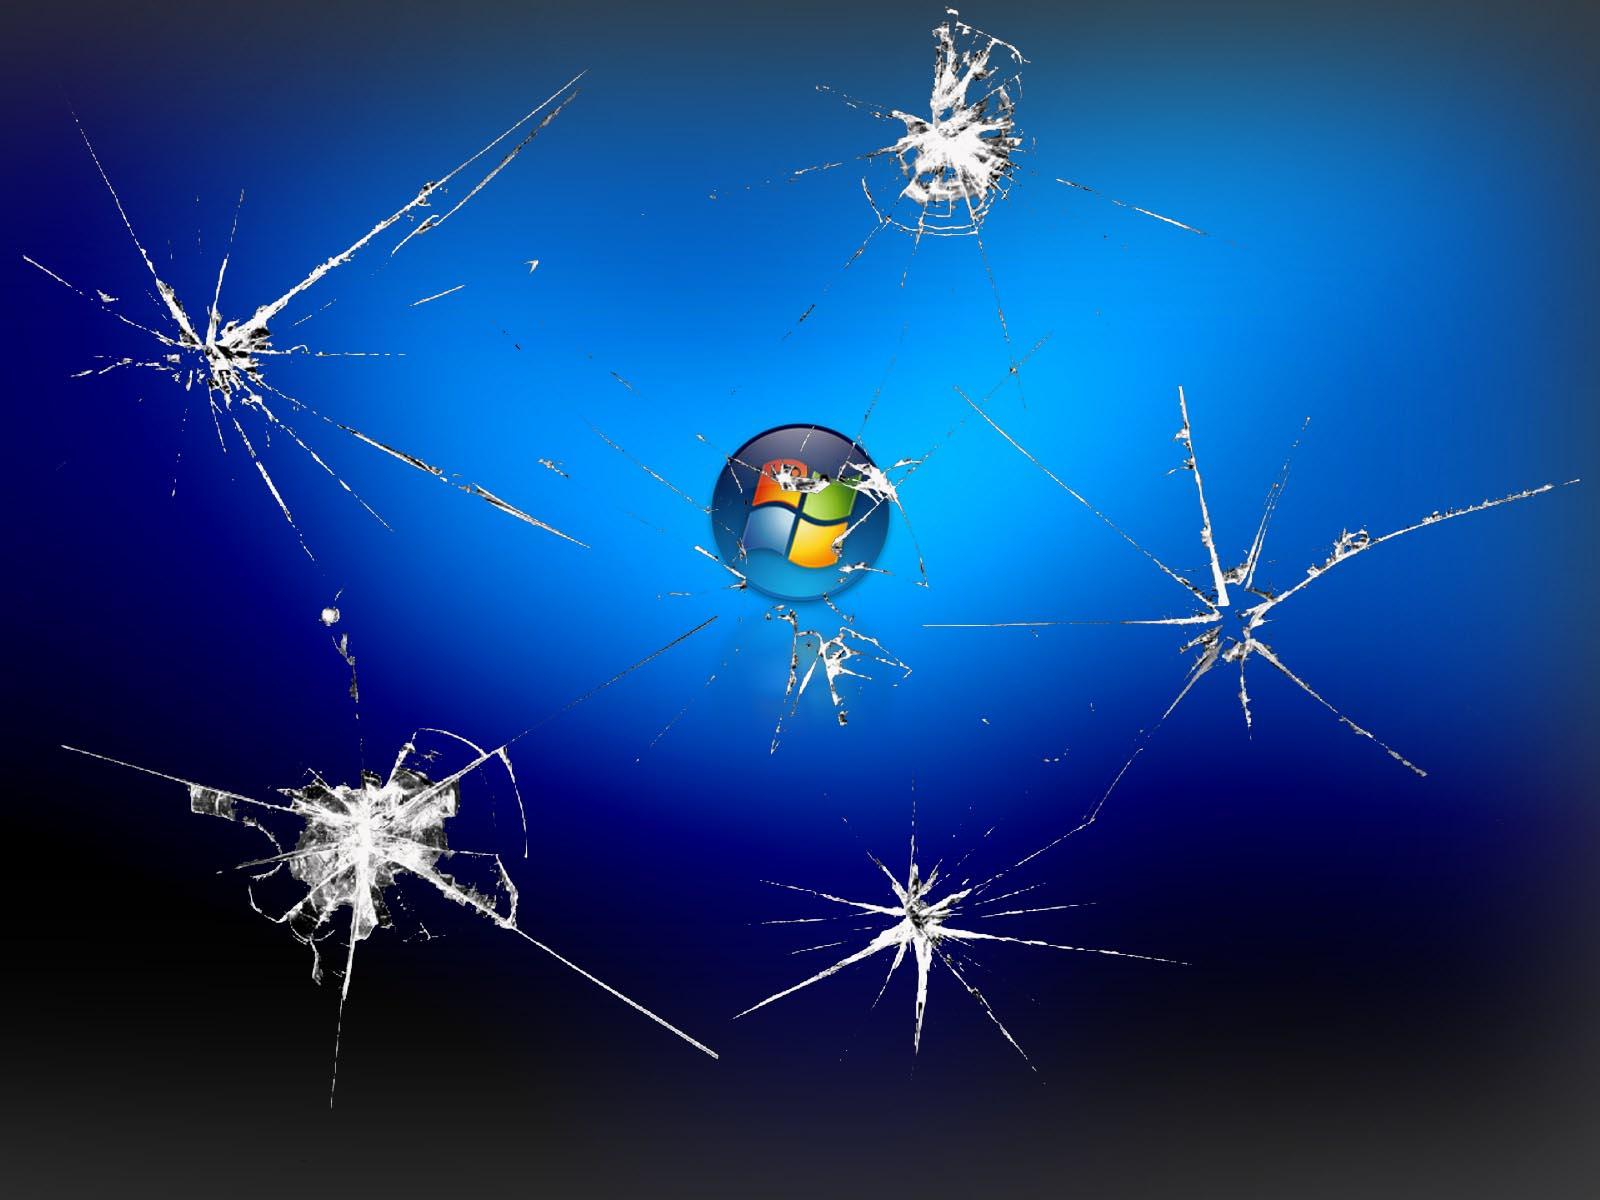 desktop screen better still set one of these cracked screen wallpapers 1600x1200